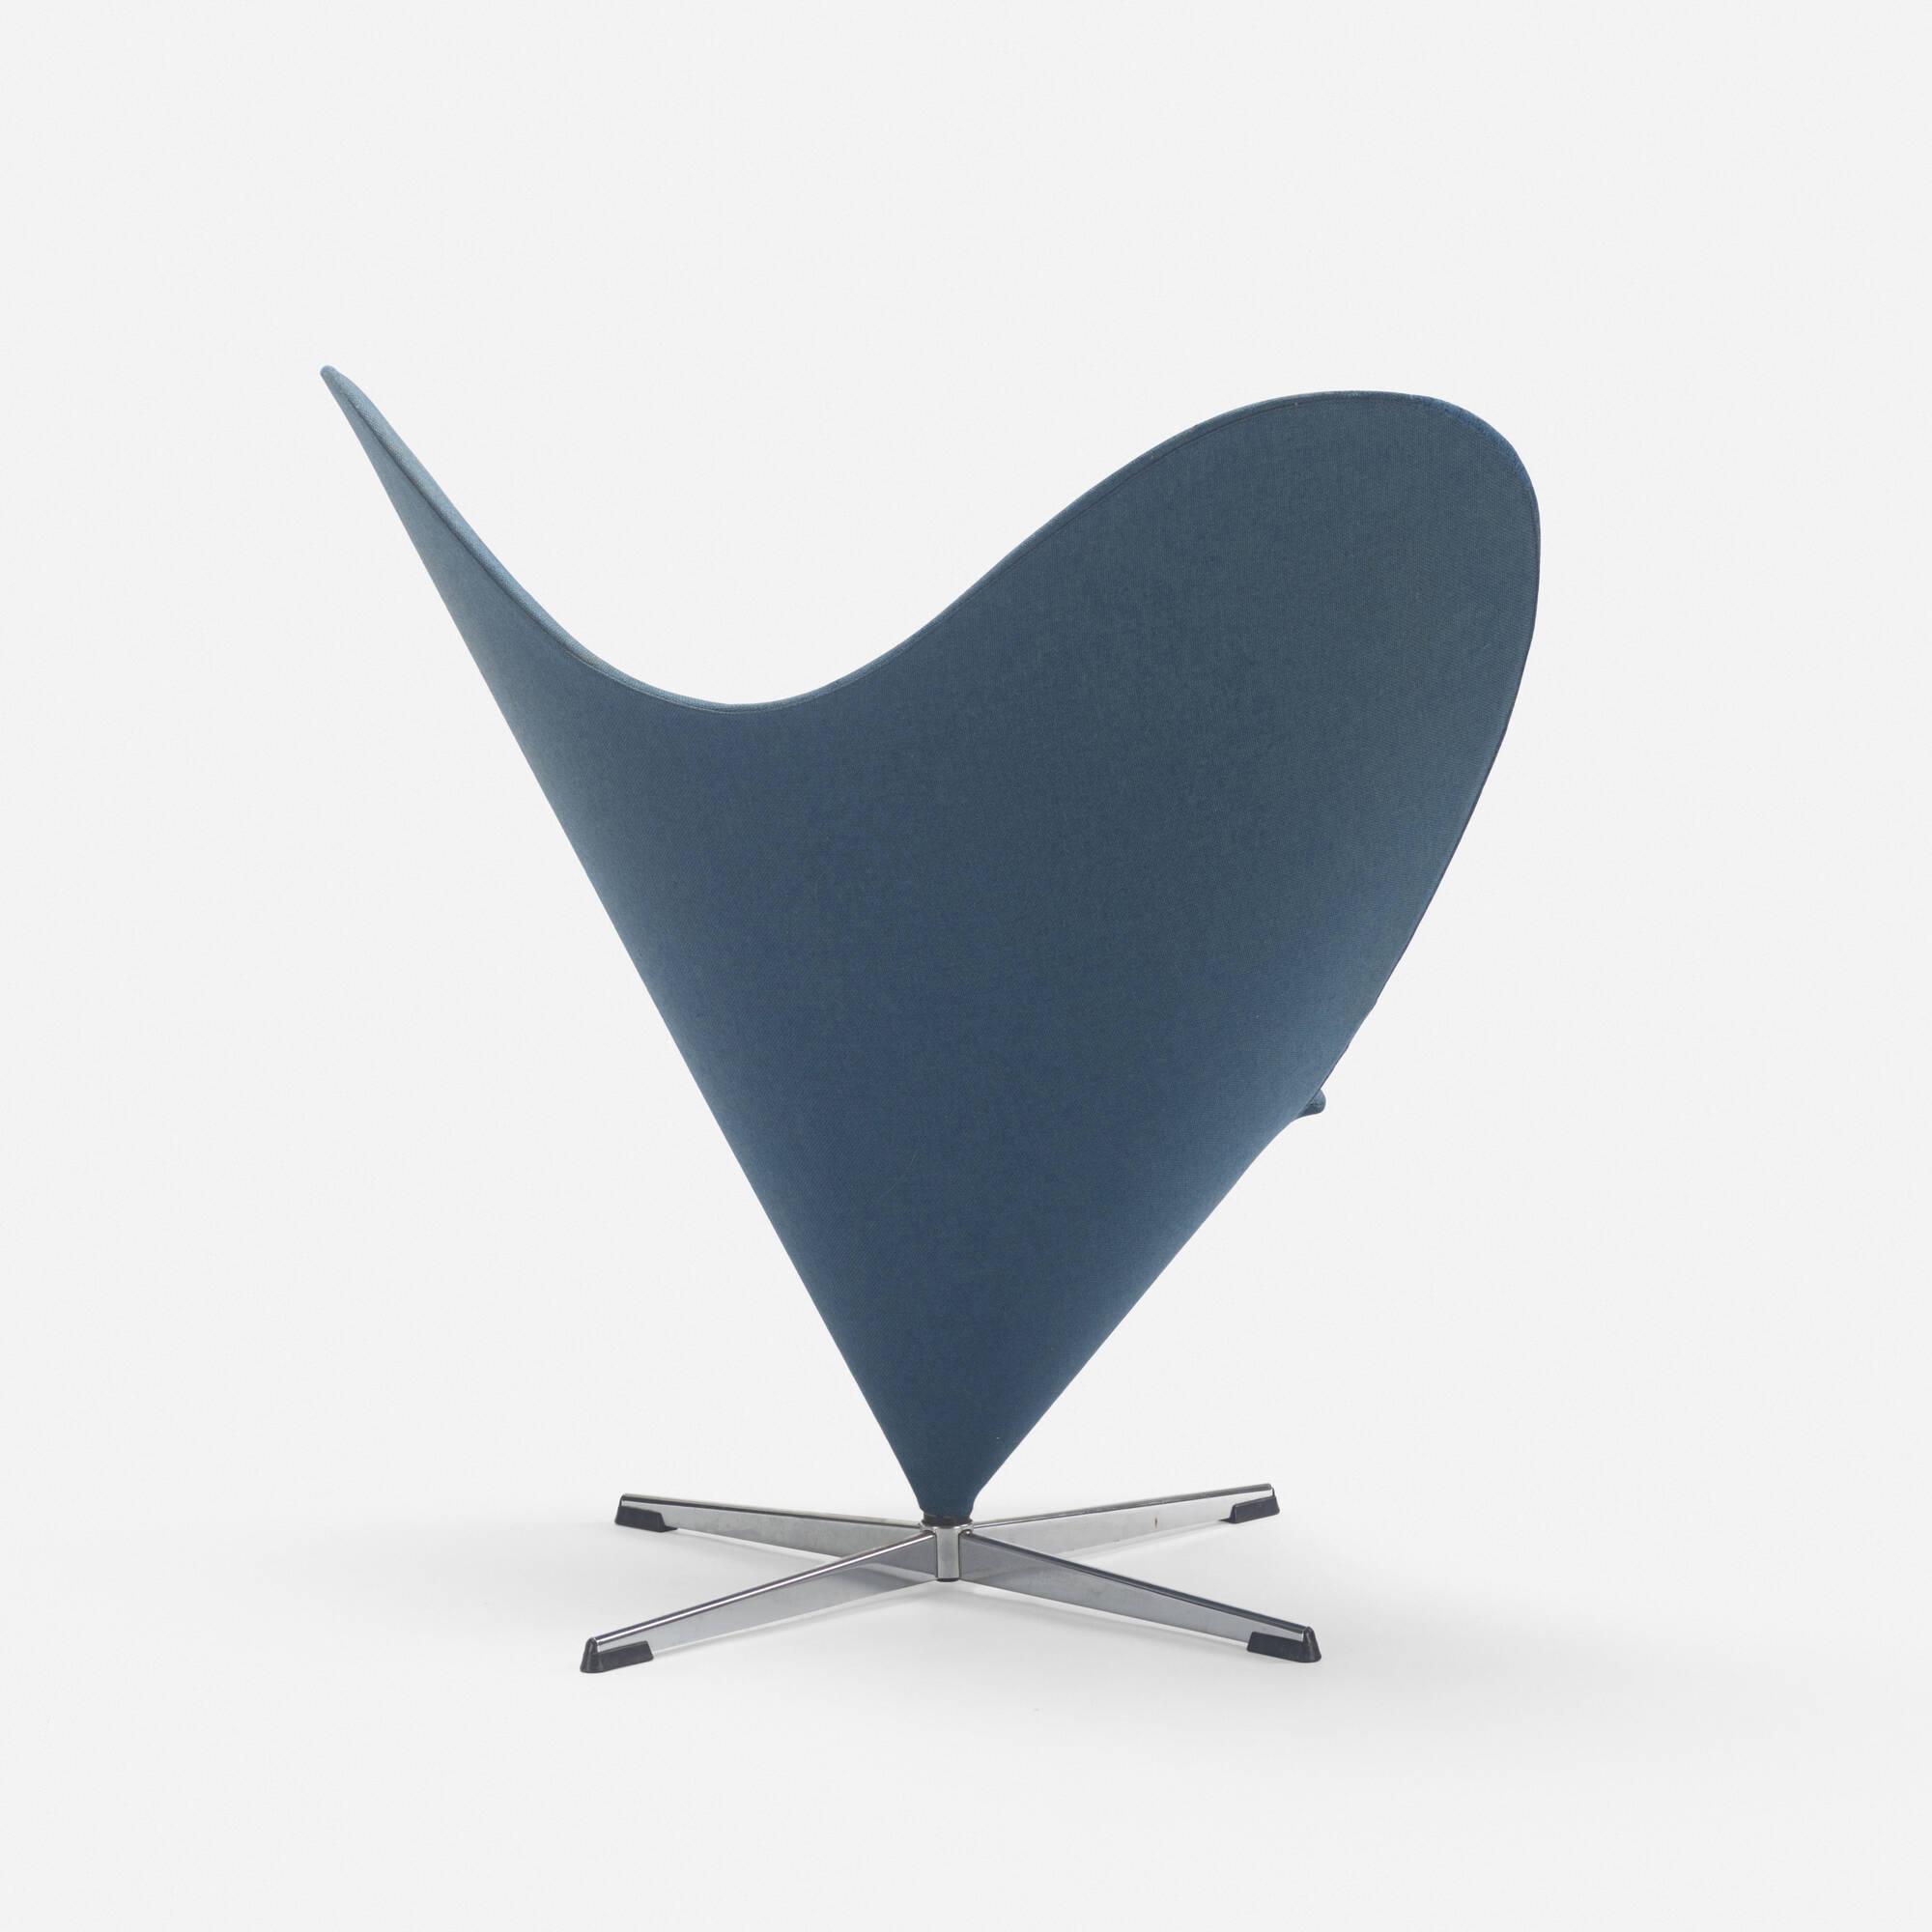 322: Verner Panton / Heart Cone chair (3 of 3)